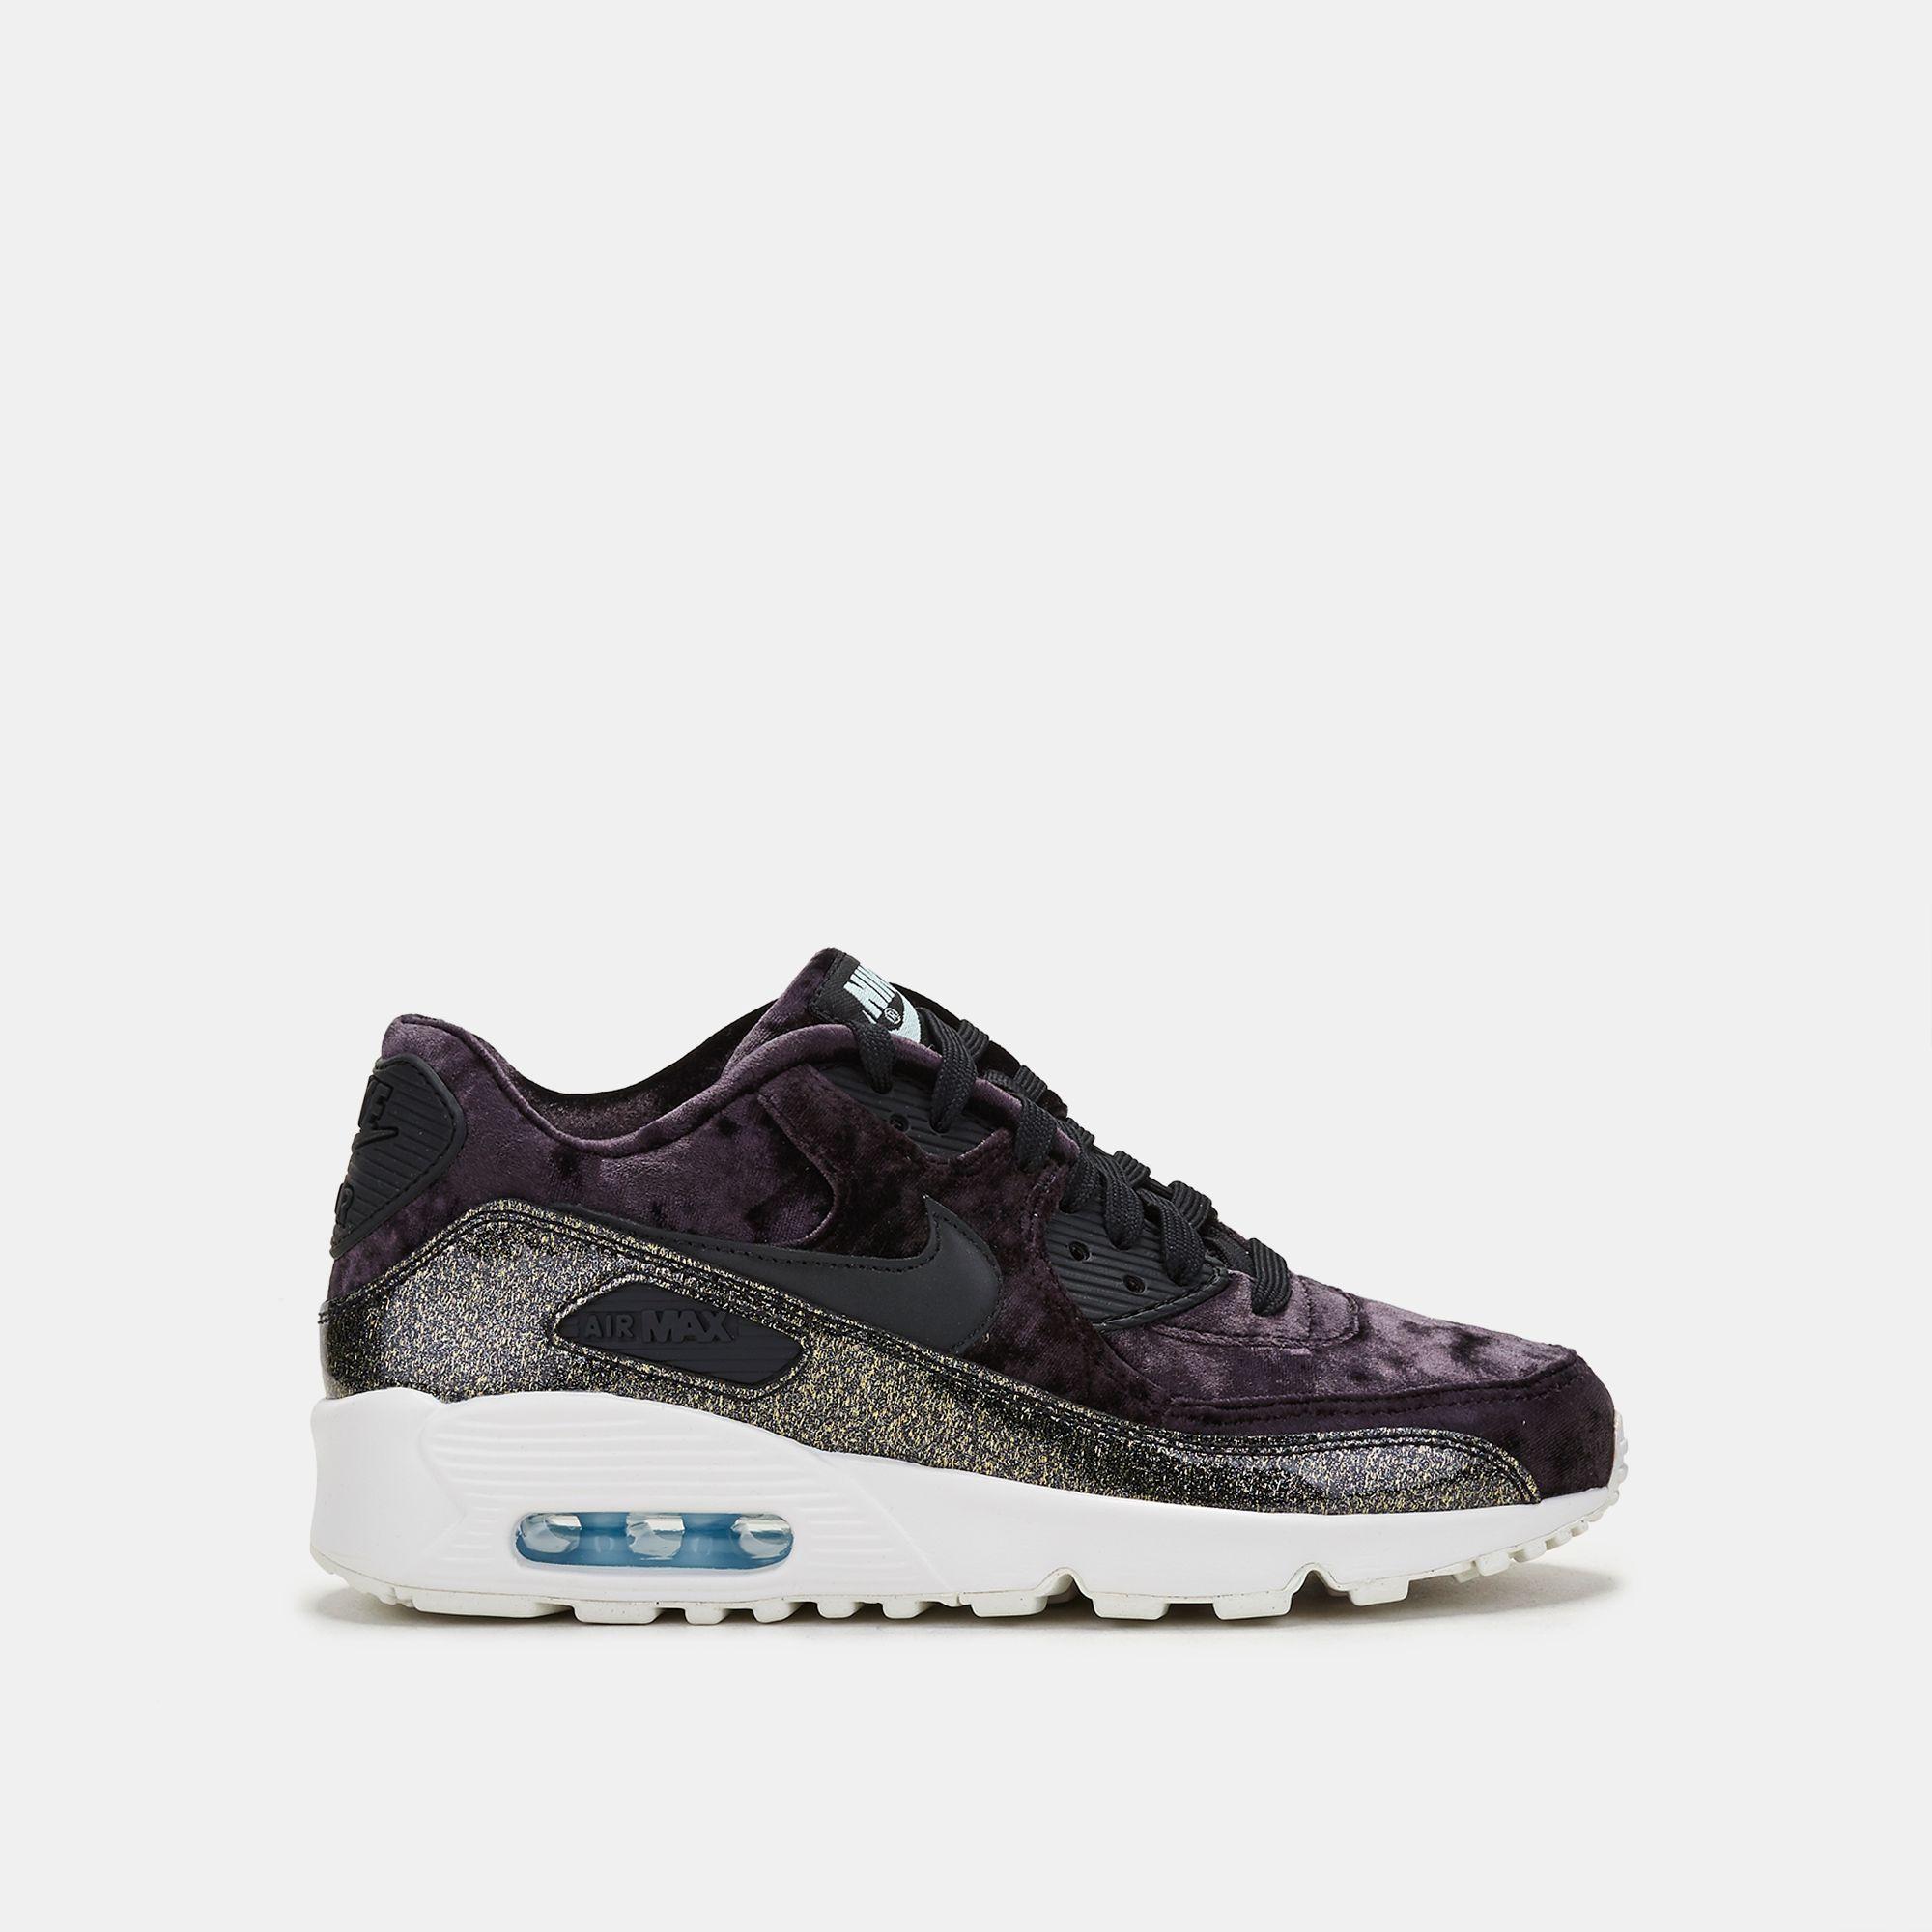 new product 4a0d8 0460a Nike Kids  Air Max 90 Pinnacle QS Shoe (Older Kids)